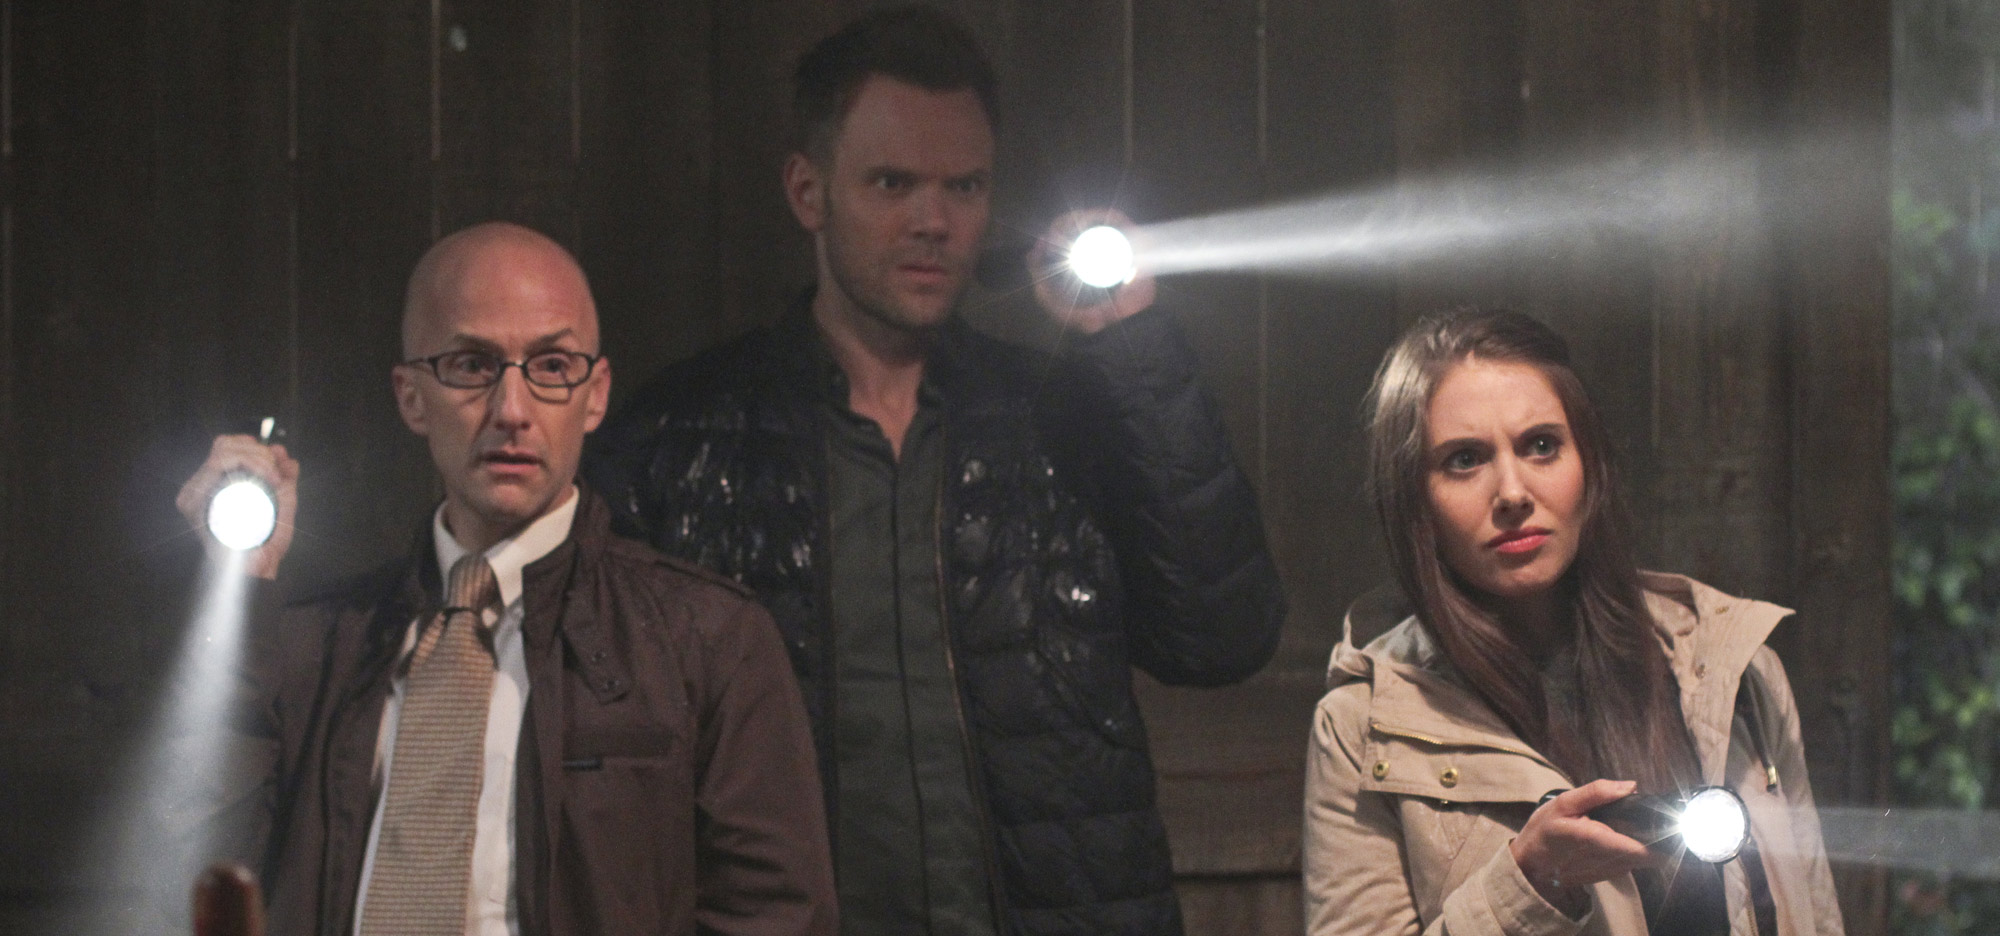 TV review: 'Community' Season 5 Episode 3, 'Basic Intergluteal